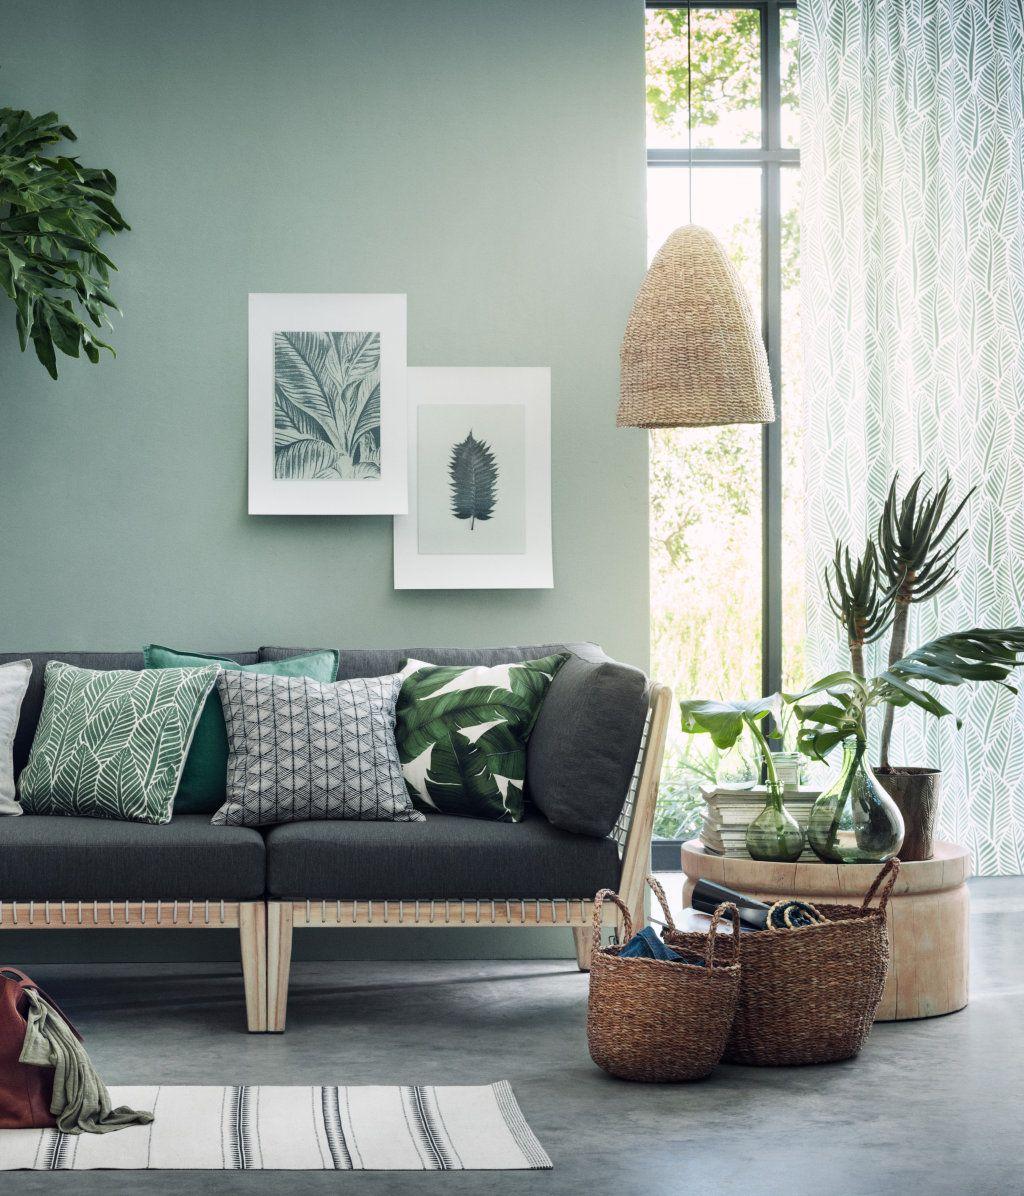 gemusterte kissenh lle anthrazit home h m de beistelltisch unser haus pinterest. Black Bedroom Furniture Sets. Home Design Ideas